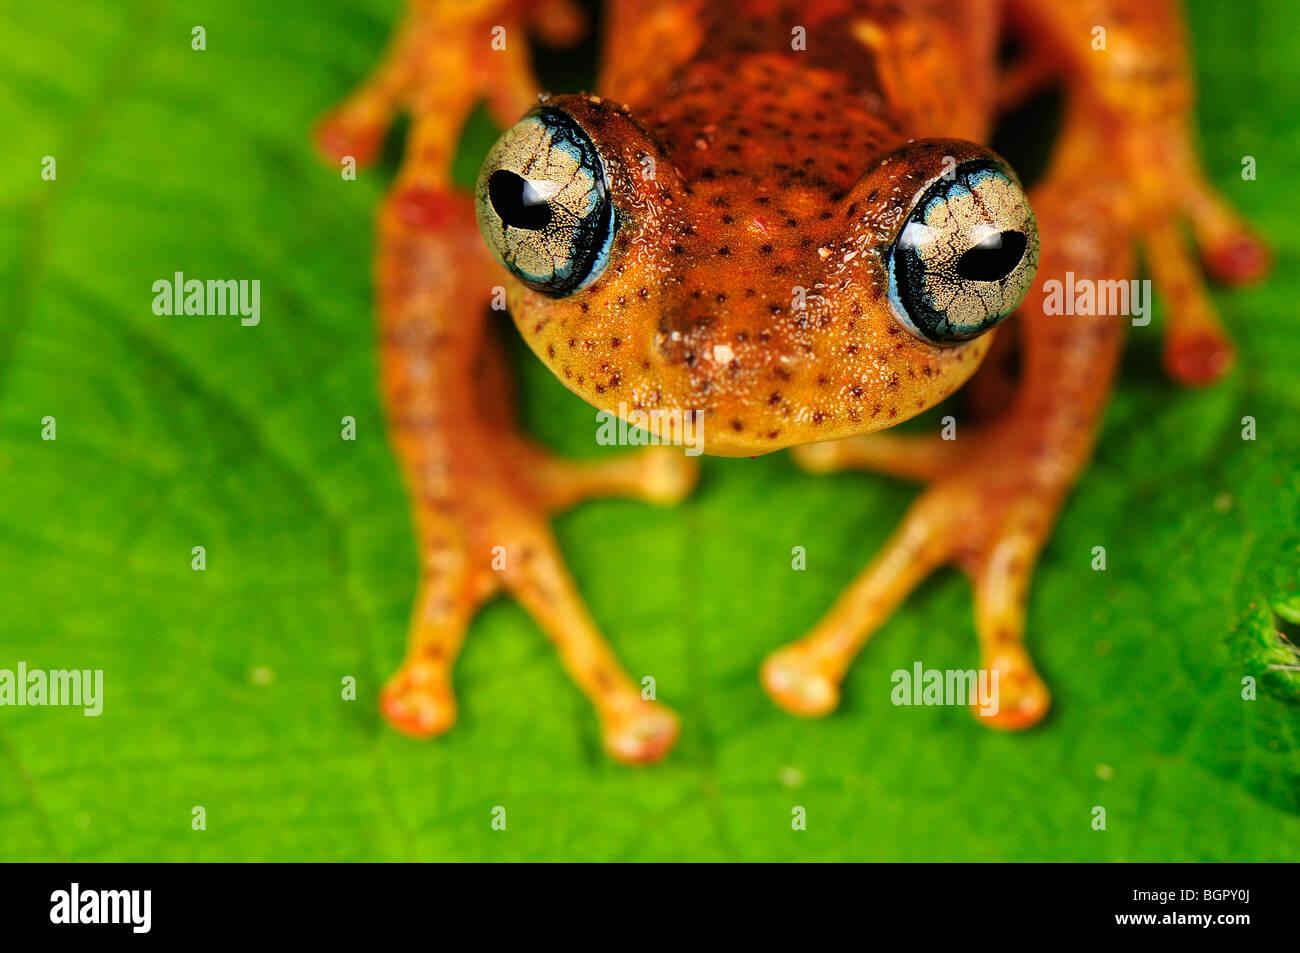 Boophis tephraeomystax Tree Frog () (Boophis difficilis}, adulto, Parque Nacional de Andasibe-Mantadia Madagascar Imagen De Stock